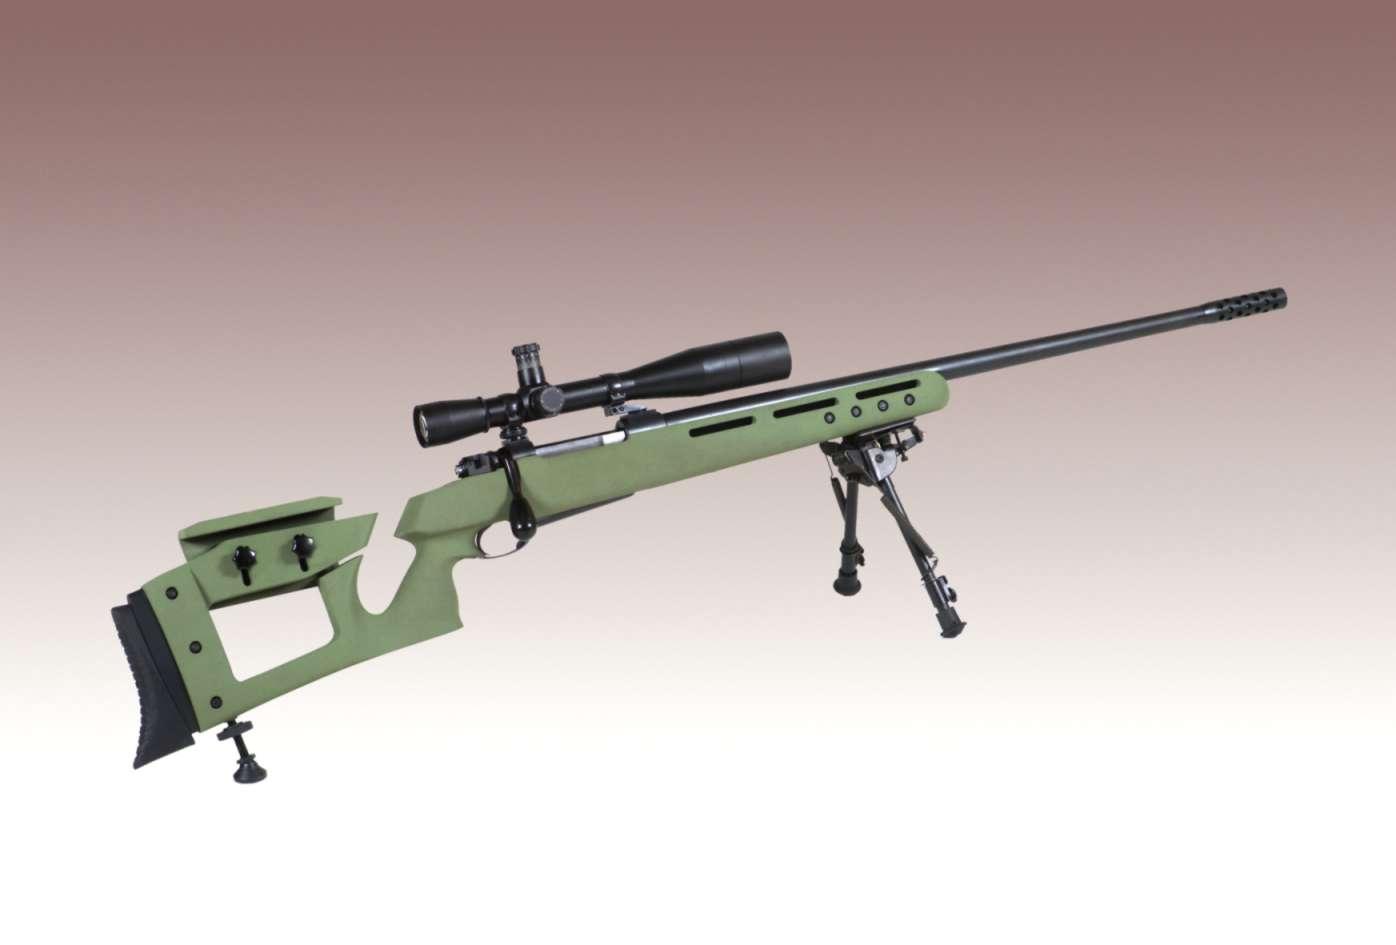 sniper wallpapers    Pheonix m6